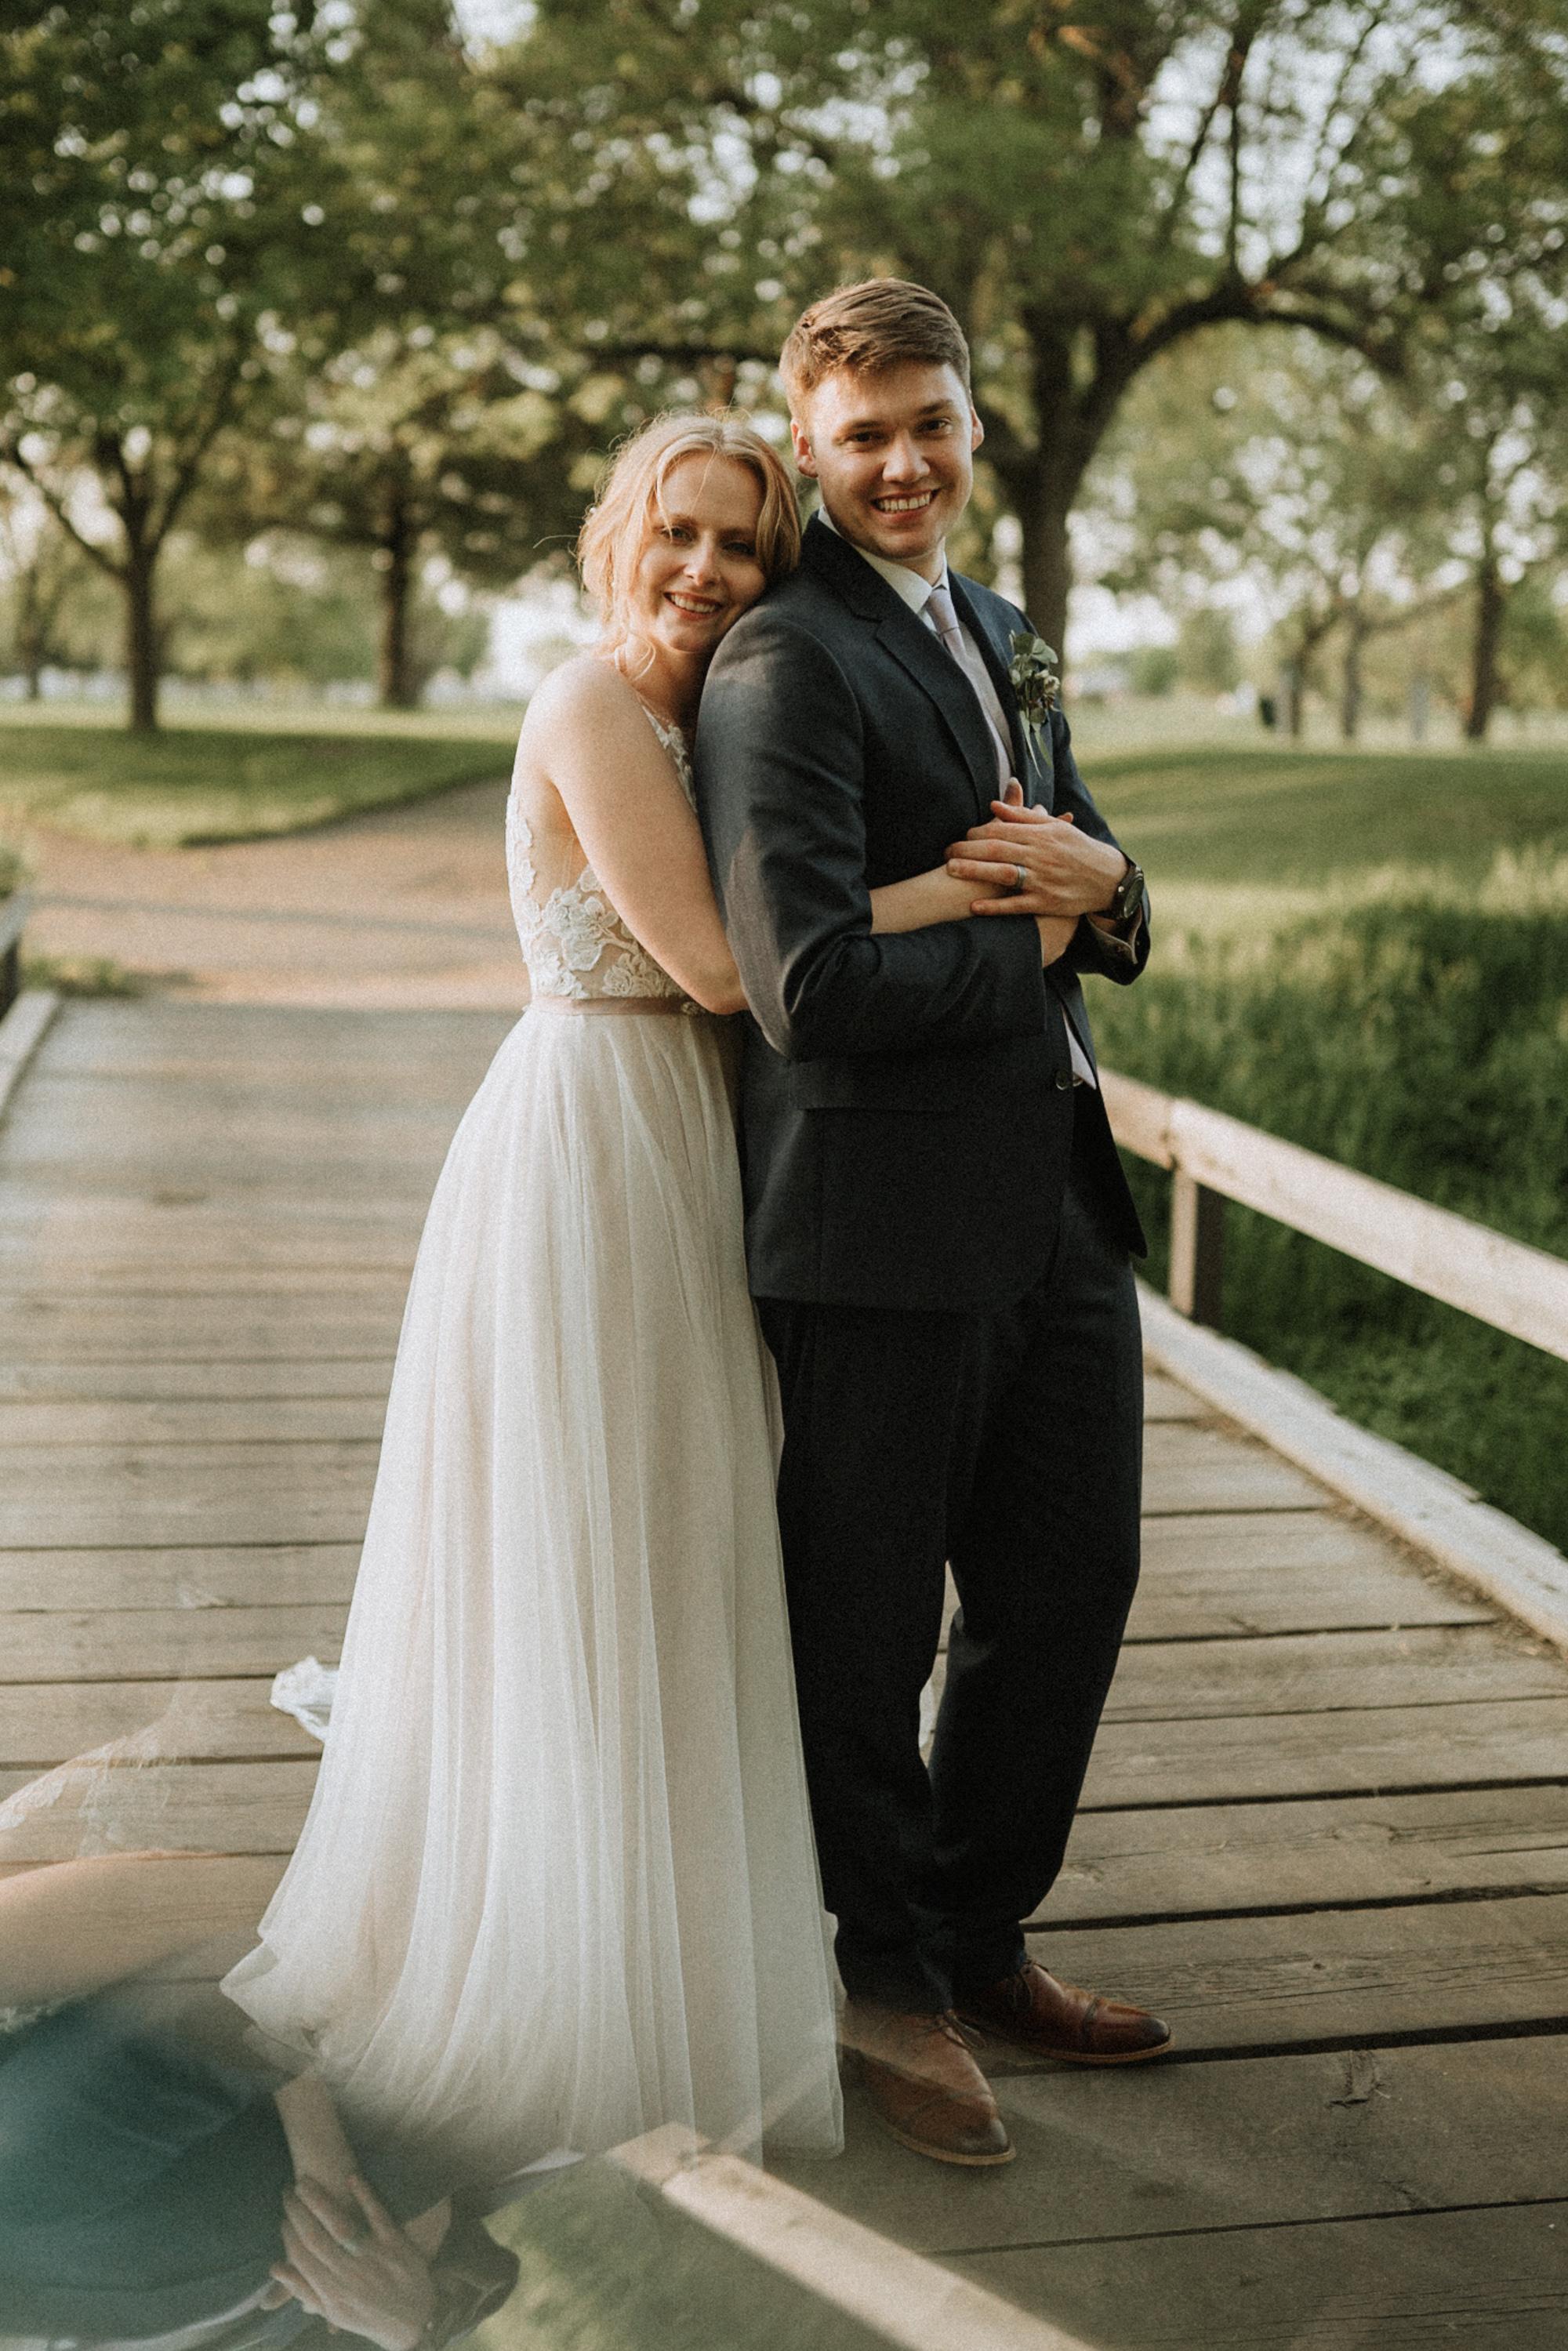 Wedding_(3_of_10).jpg